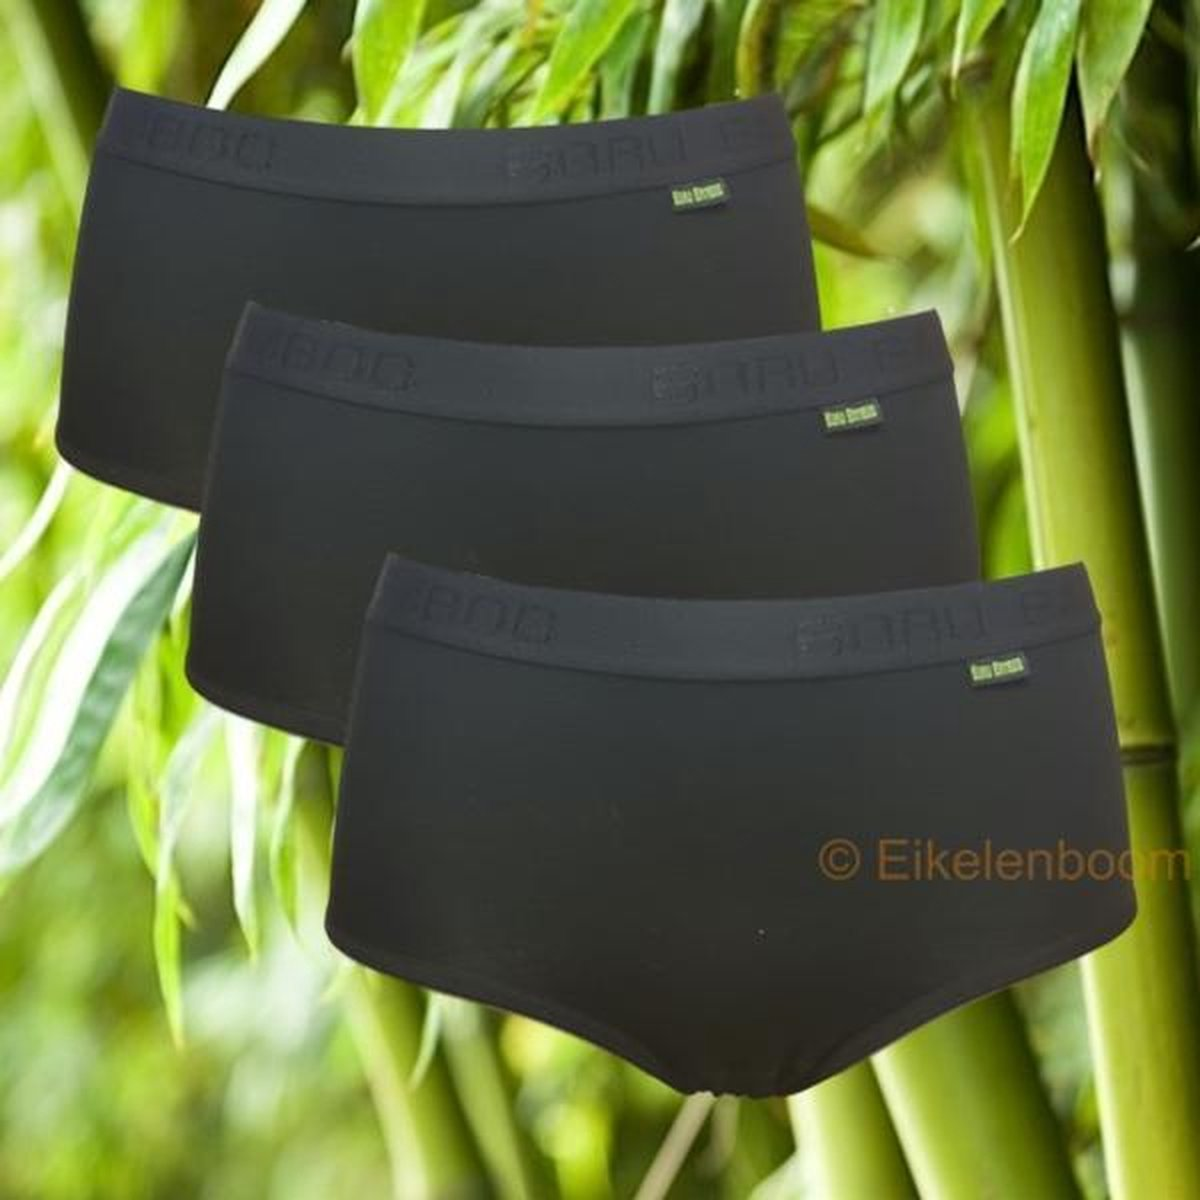 Boru Bamboo   Ondergoed Dames   3-pack dames midislip   zwart   MAAT XL